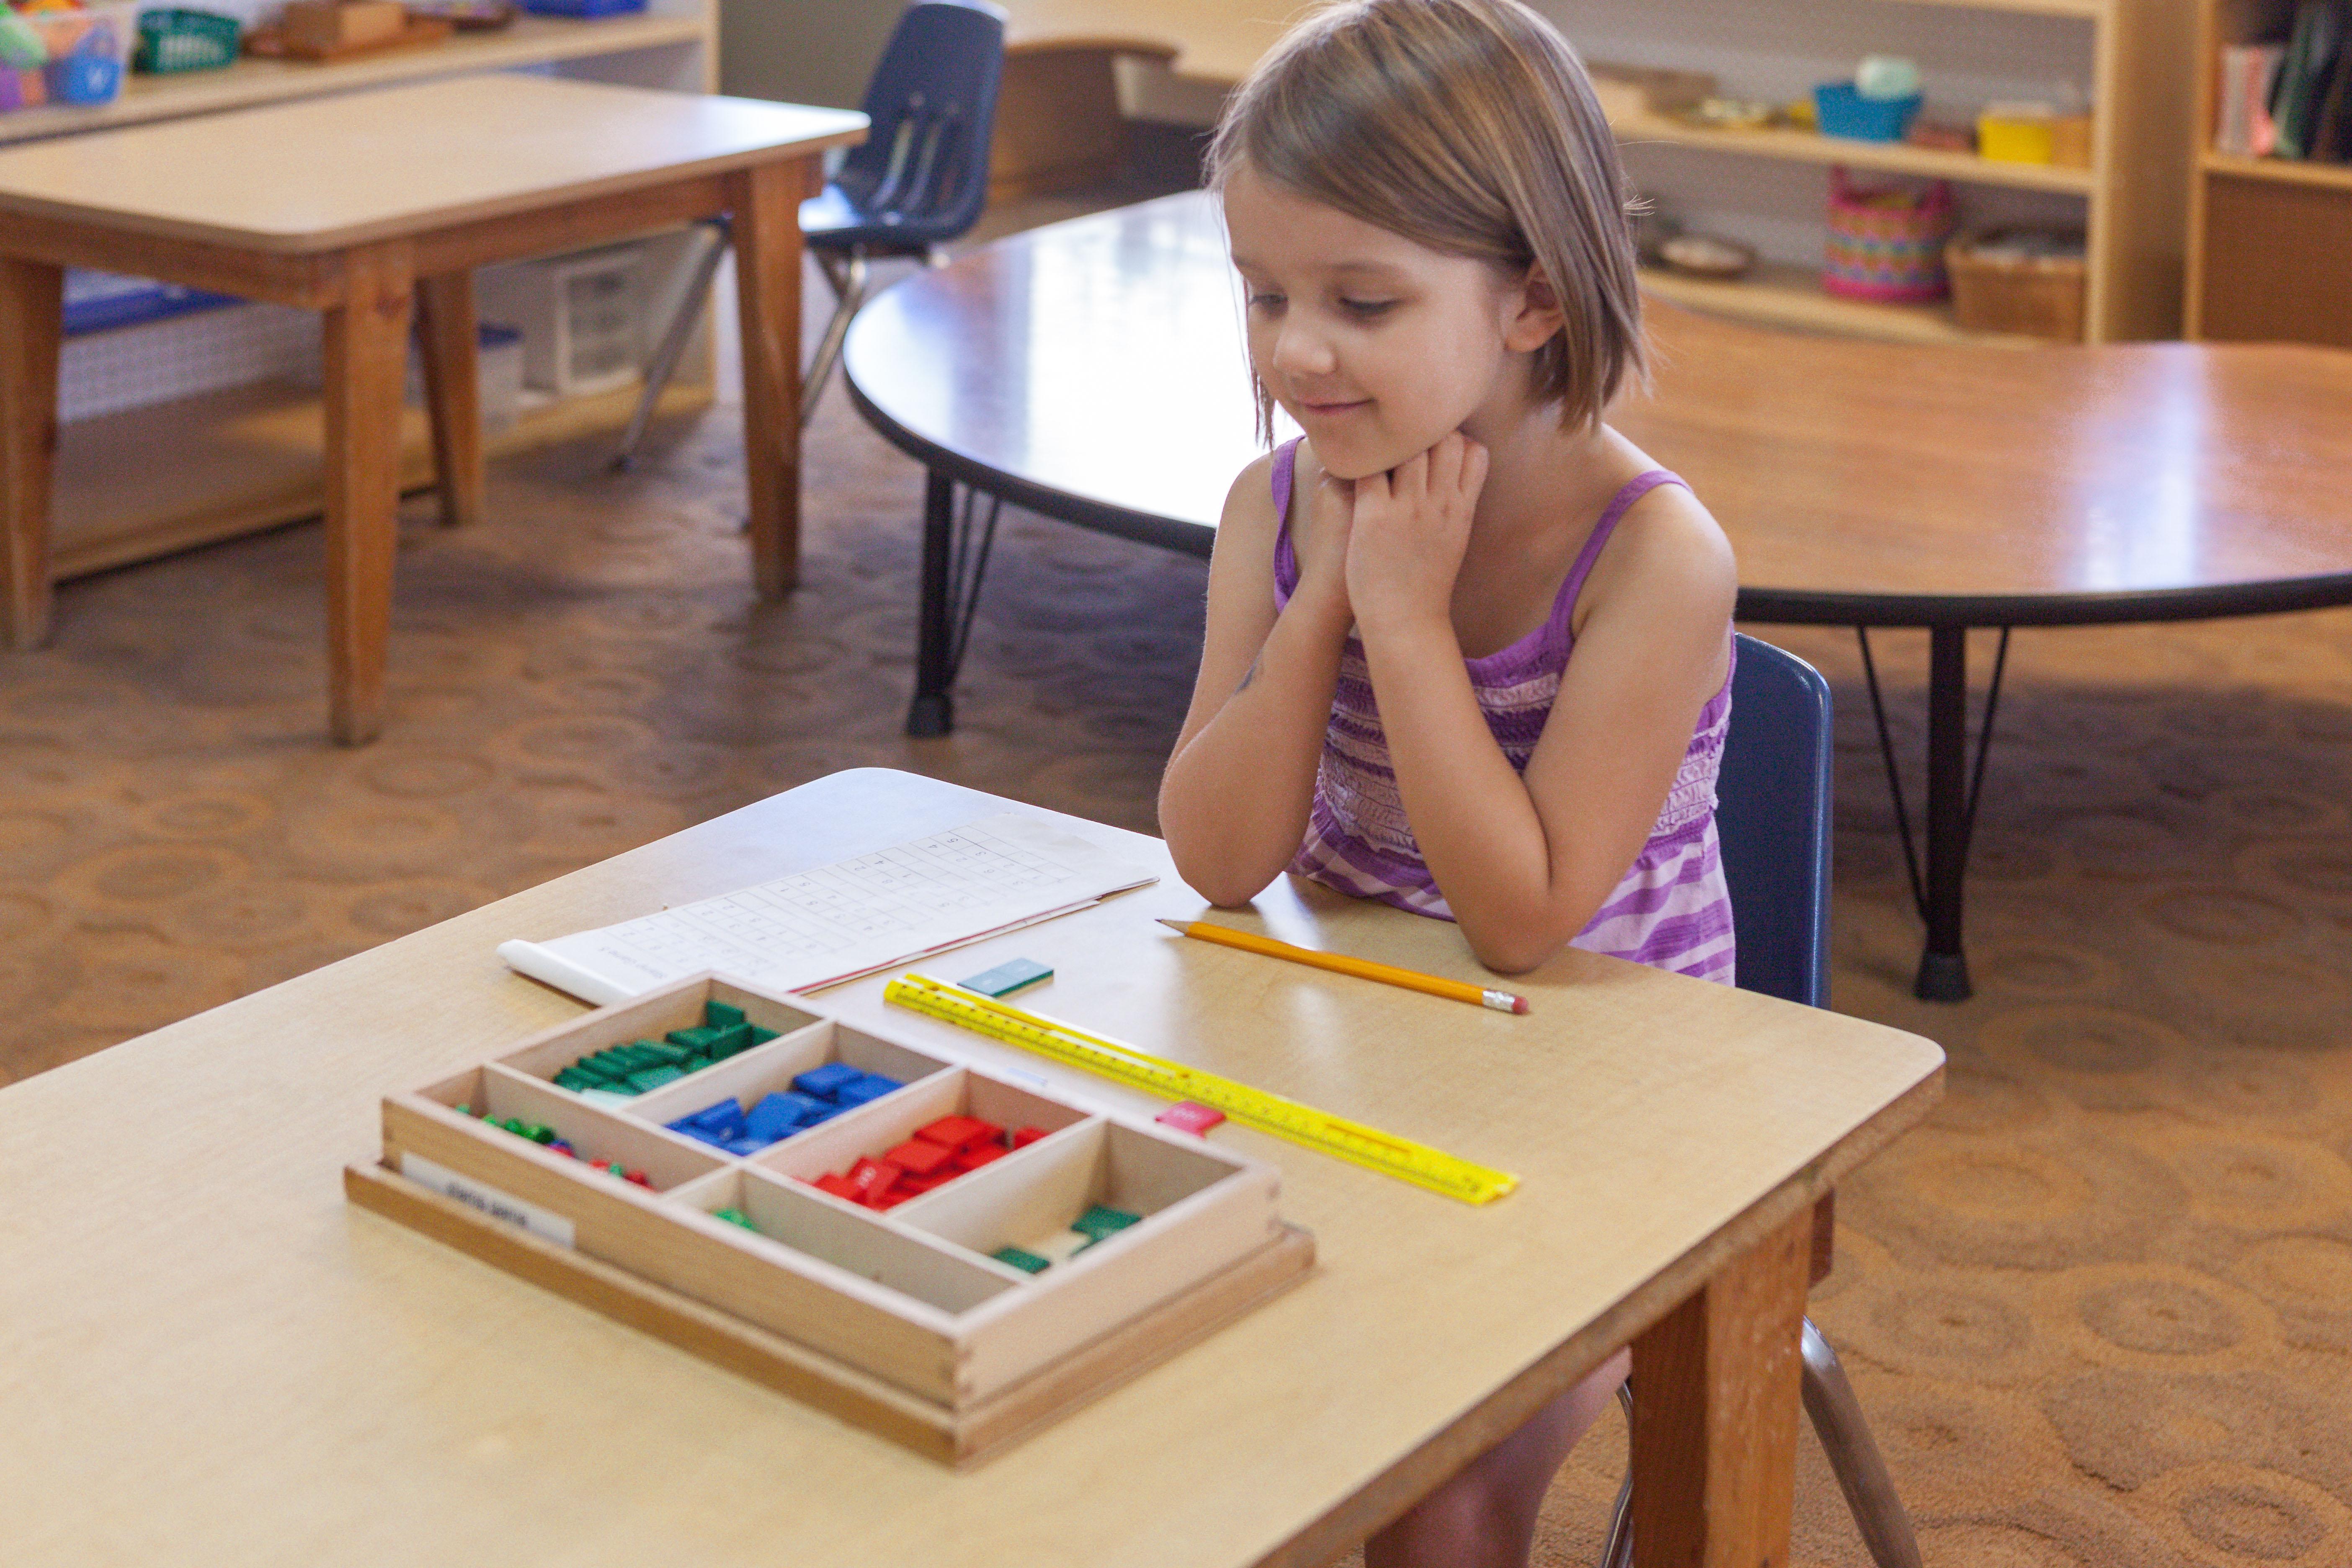 Step By Step Montessori Schools of Chaska